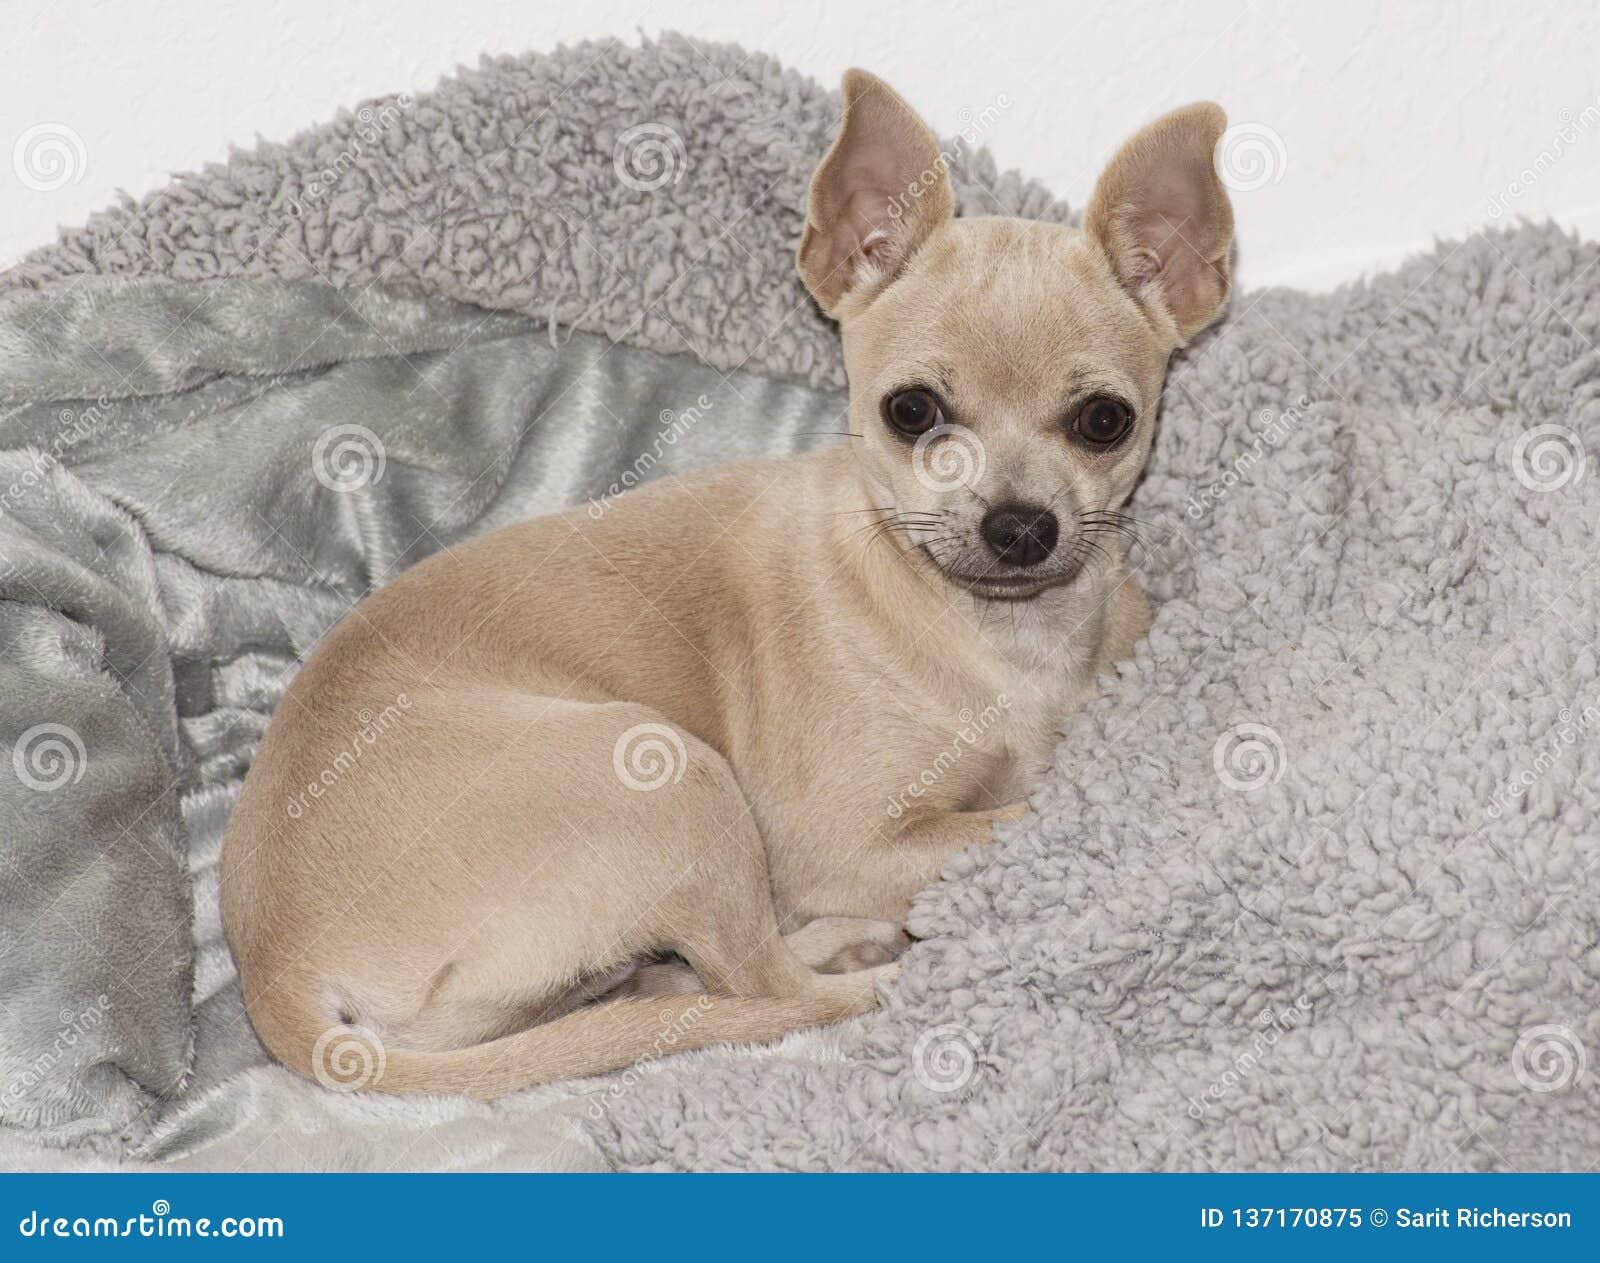 Buff Beige Chihuahua Puppy En Grey Fleece Blanket Imagen De Archivo Imagen De Chihuahua Beige 137170875